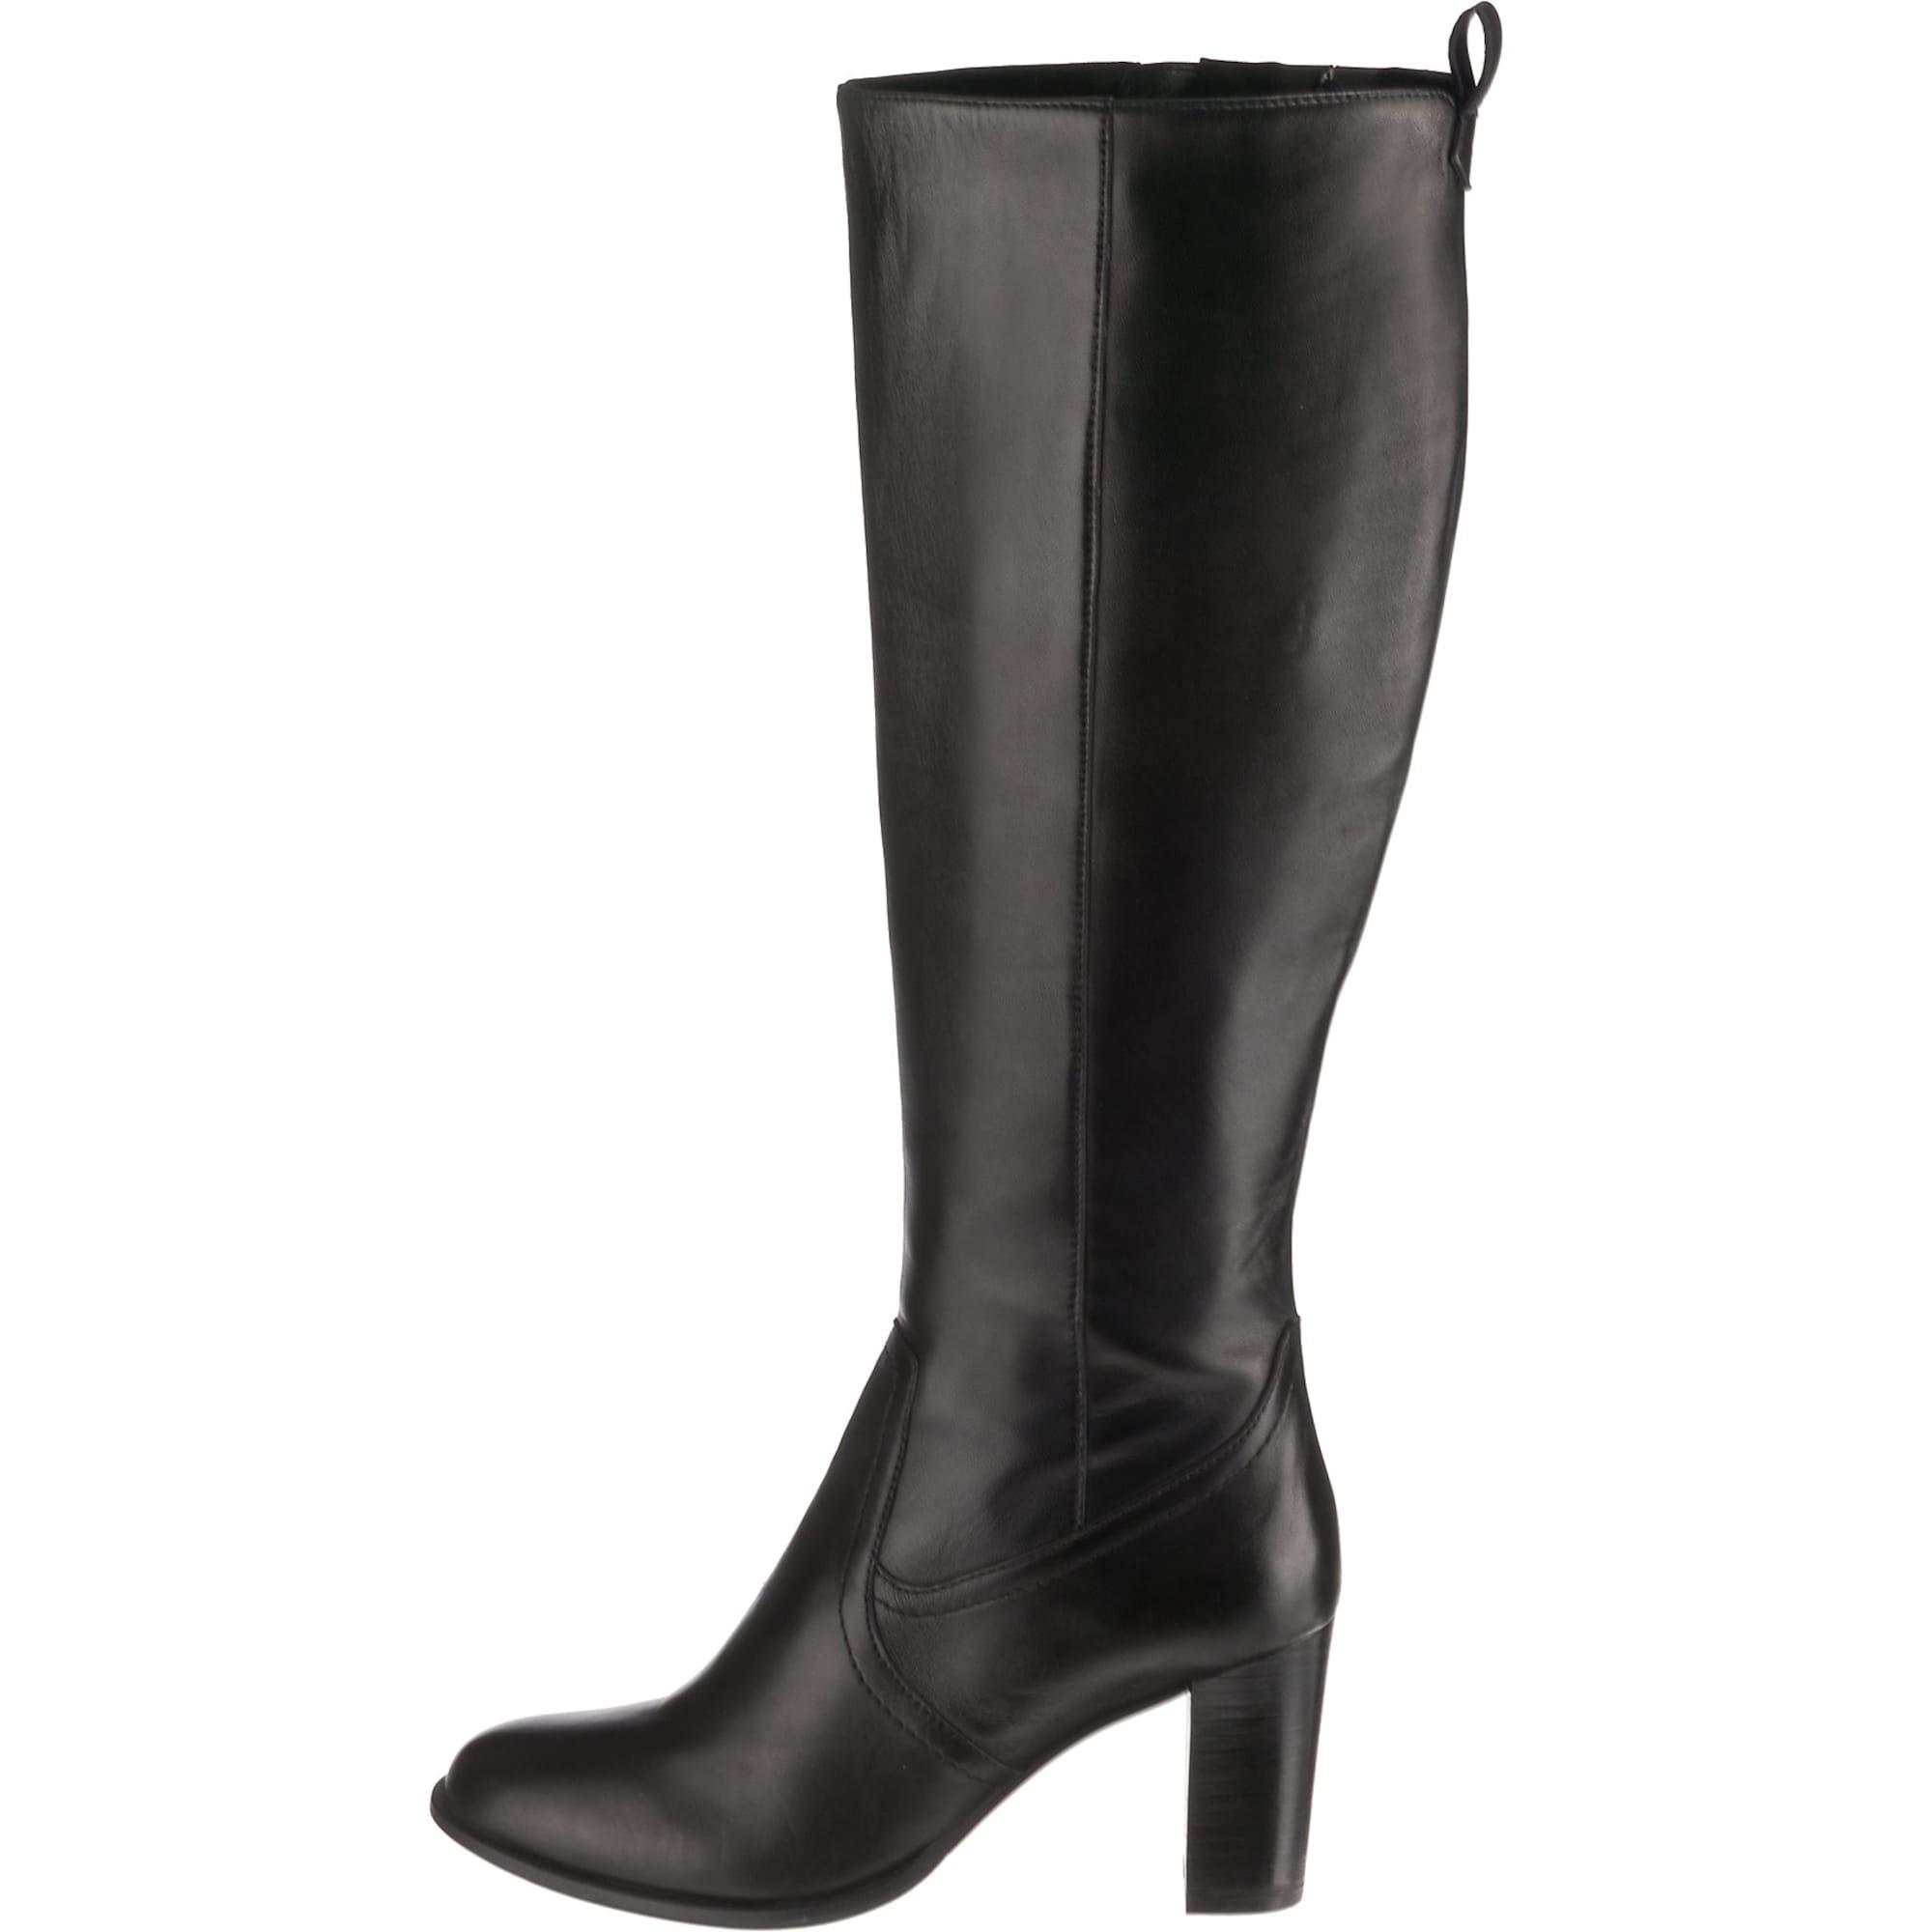 spm - Klassische Stiefel 'Juran'